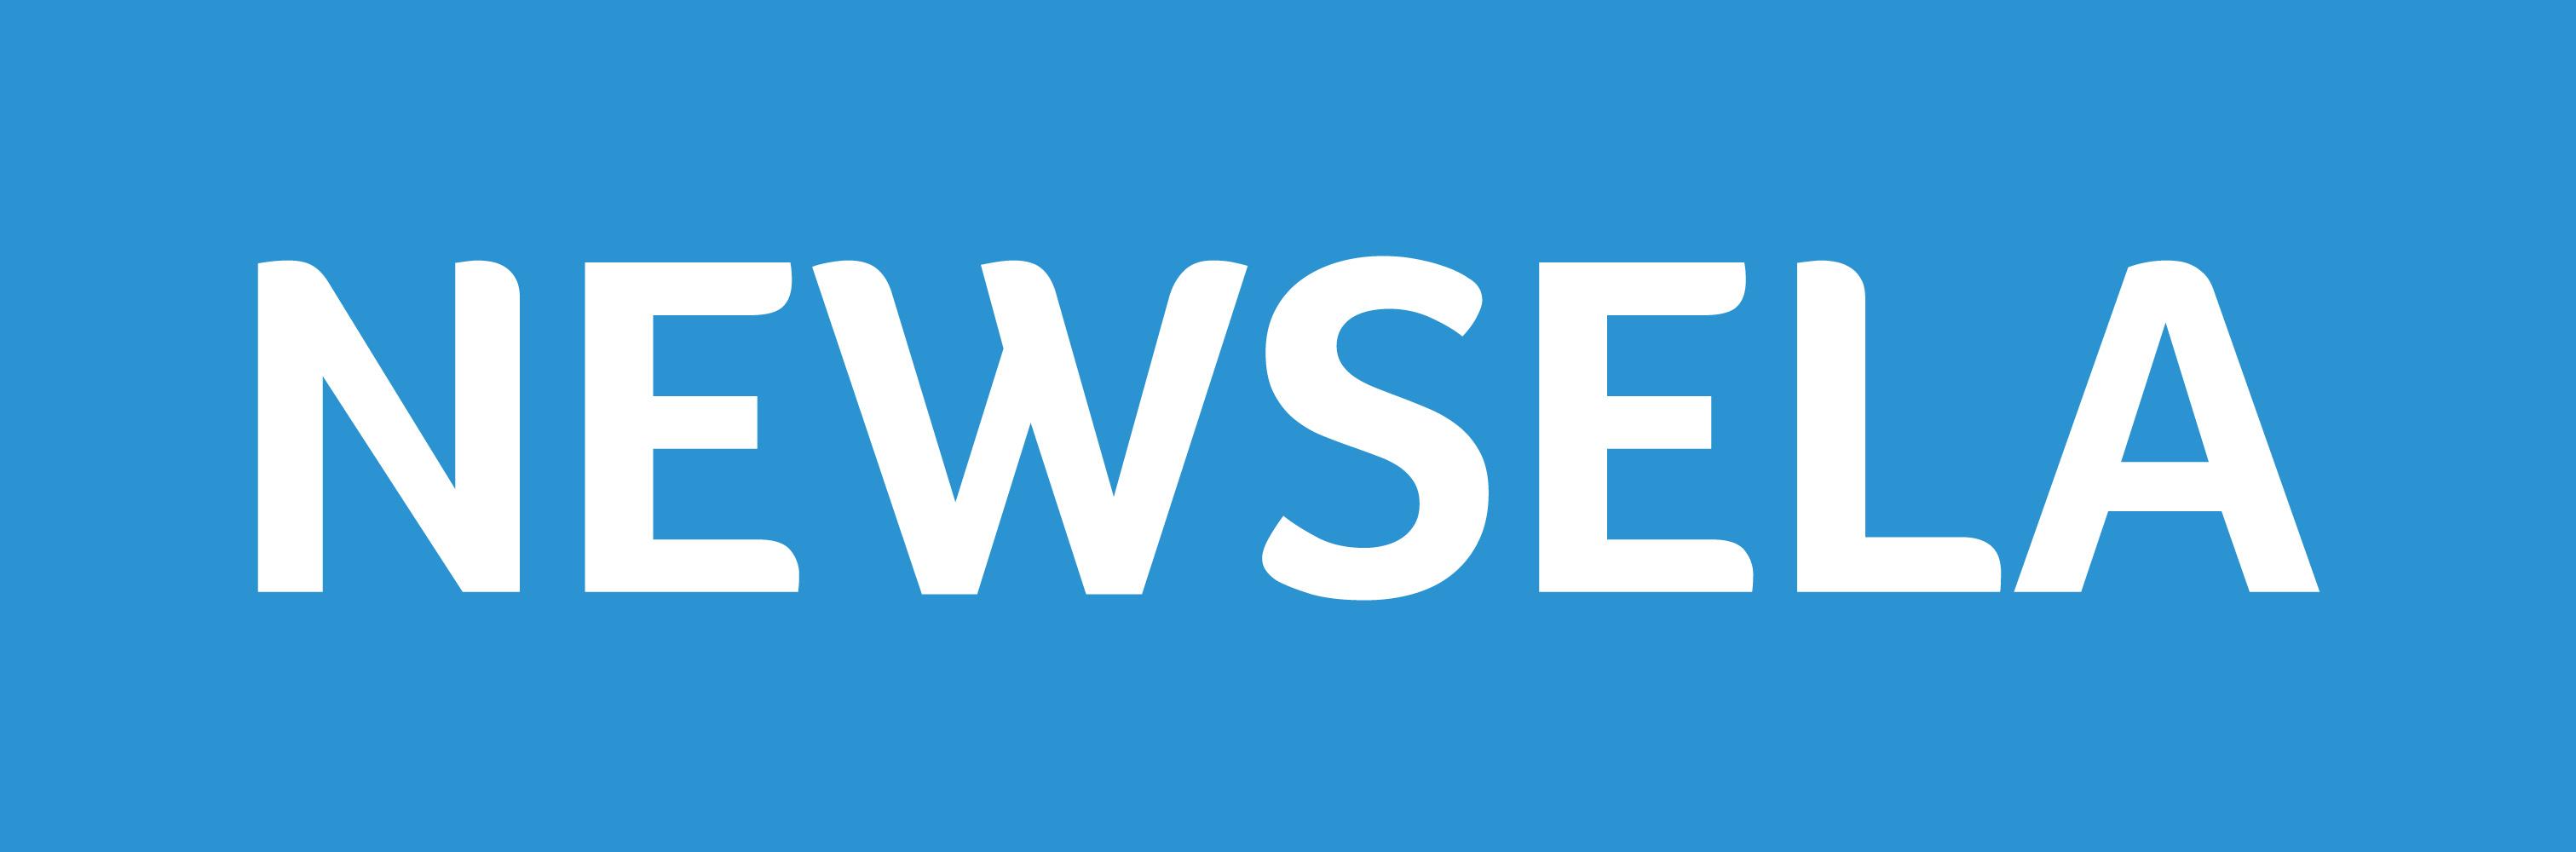 Image result for newsela logo